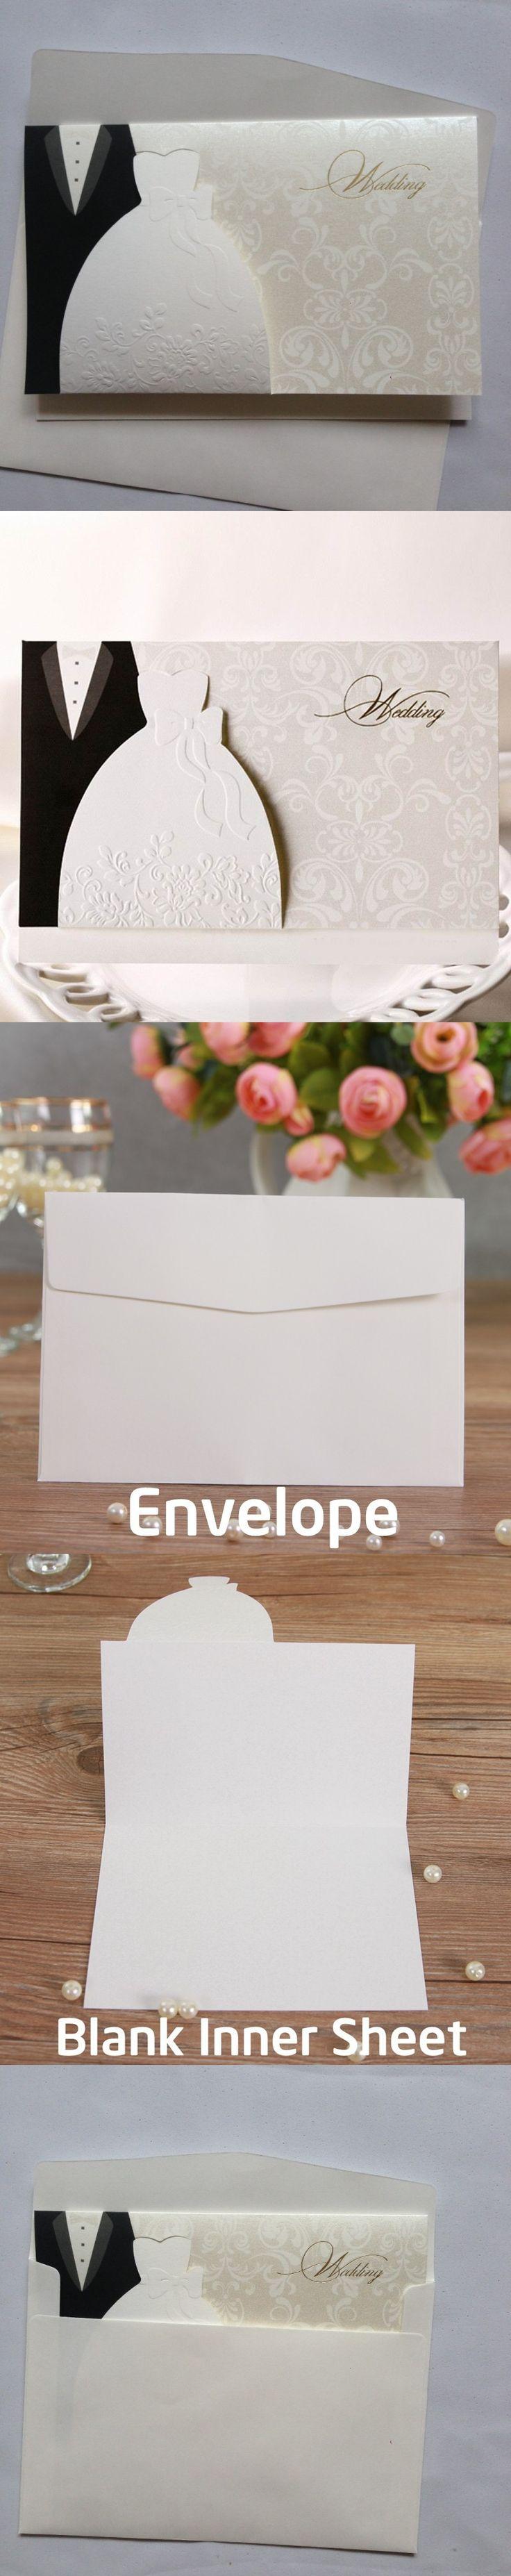 Best 25+ Wedding invitation supplies ideas on Pinterest | How to ...